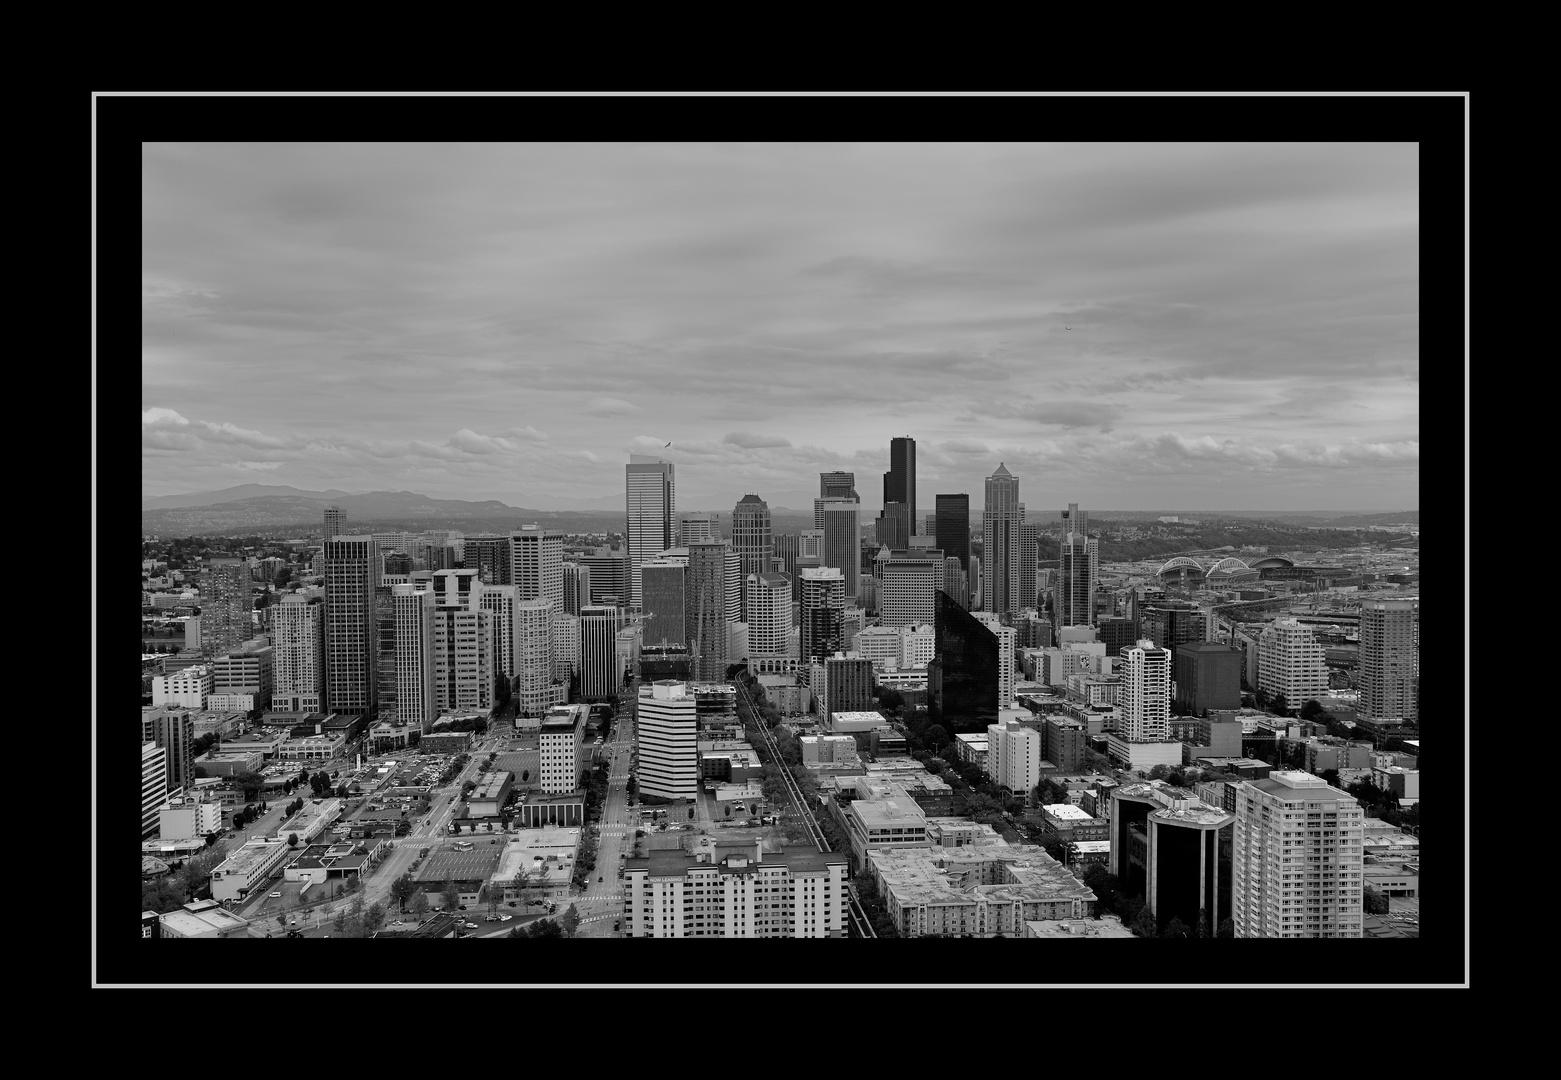 Seattle 2 in schwarz /weiss